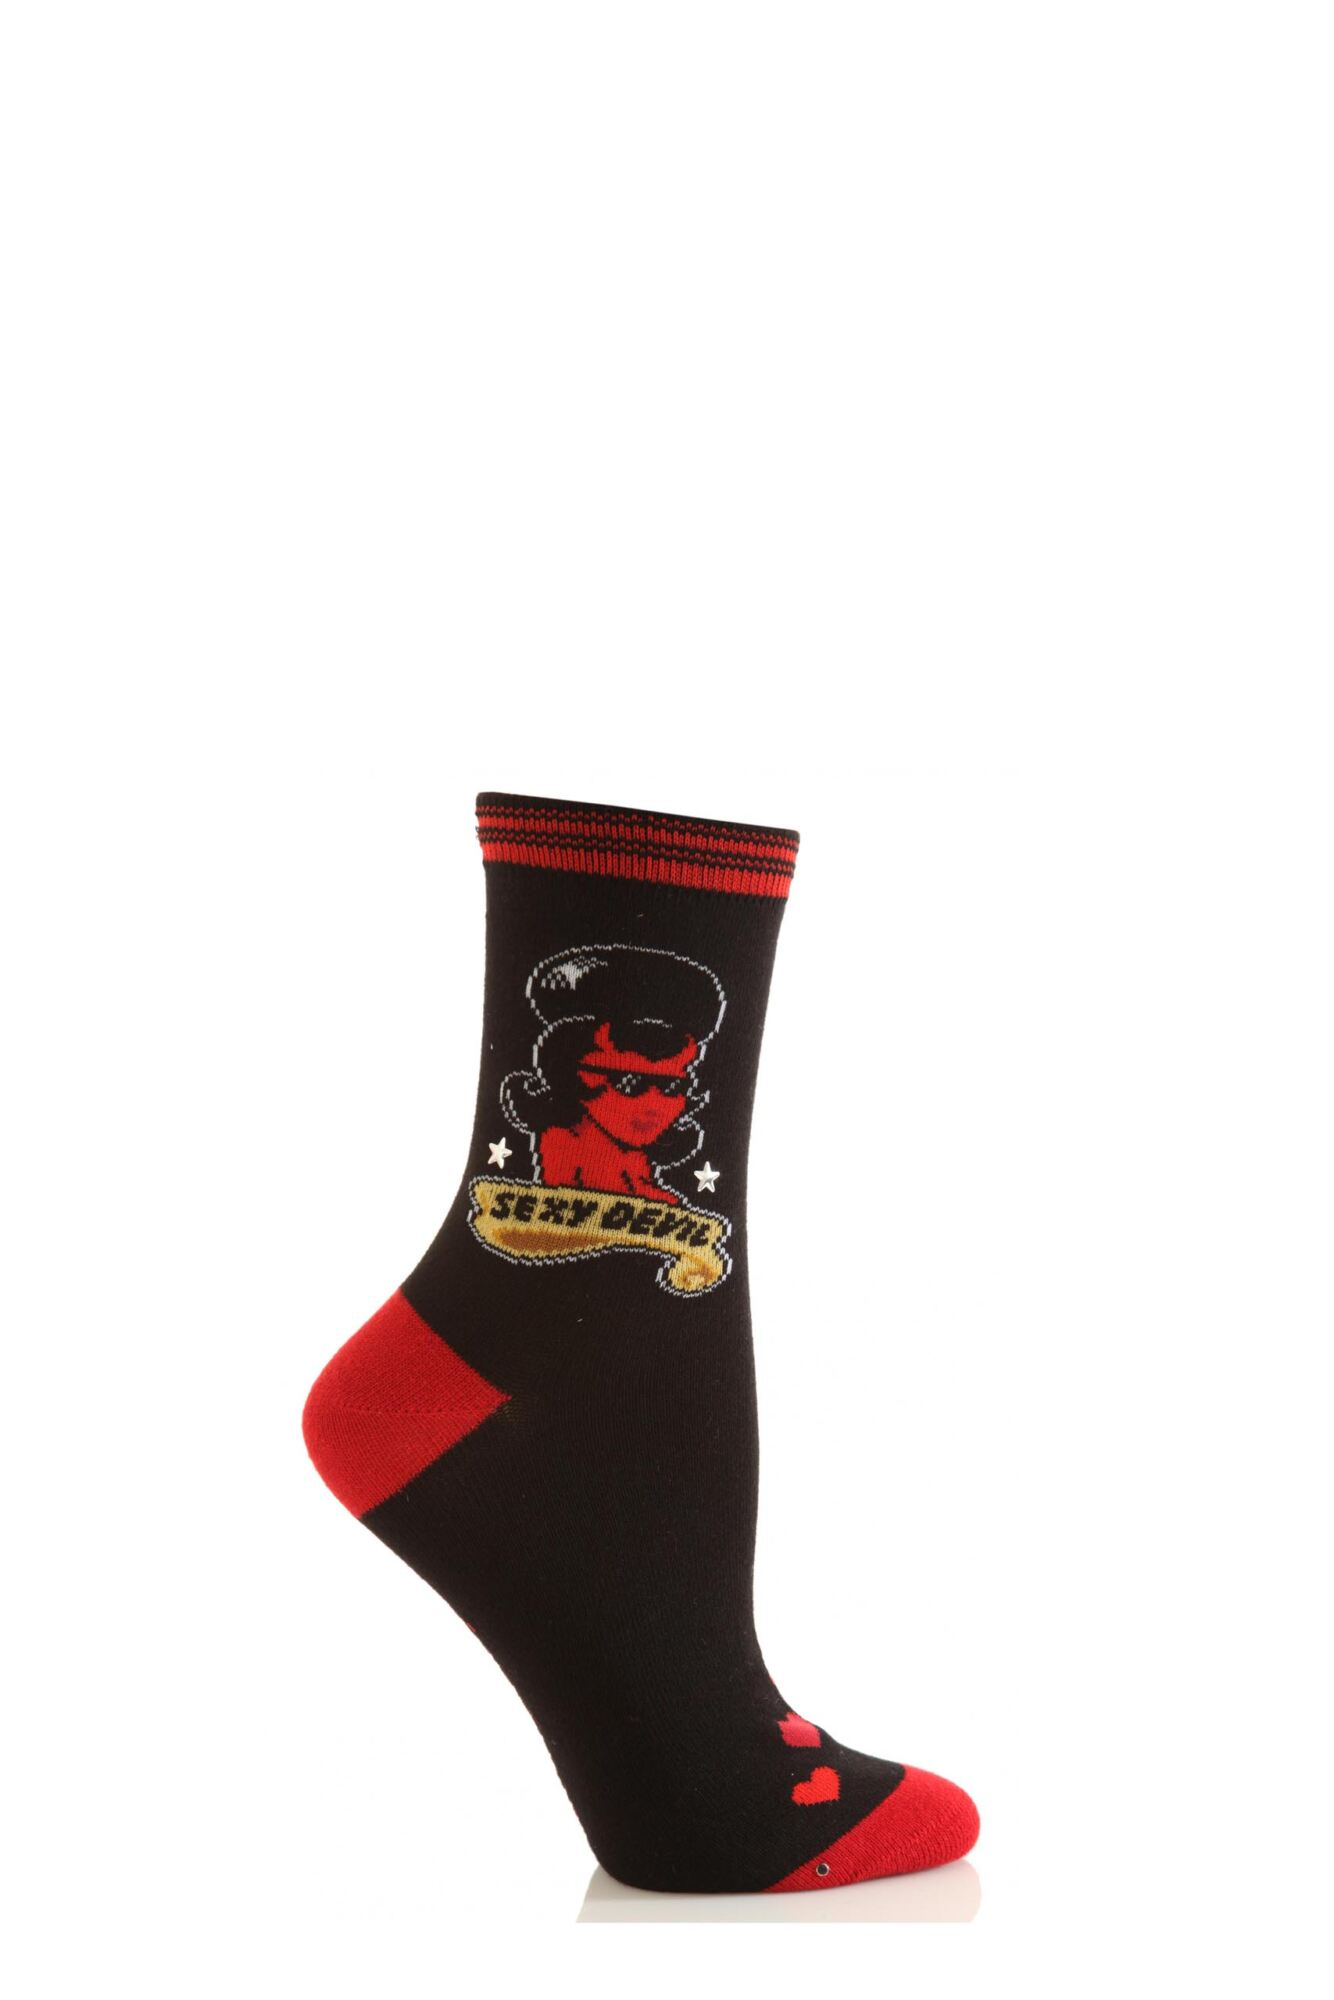 1 Pair Dare To Wear Novelty Socks - Sexy Devil 75% OFF Ladies - SOCKSHOP